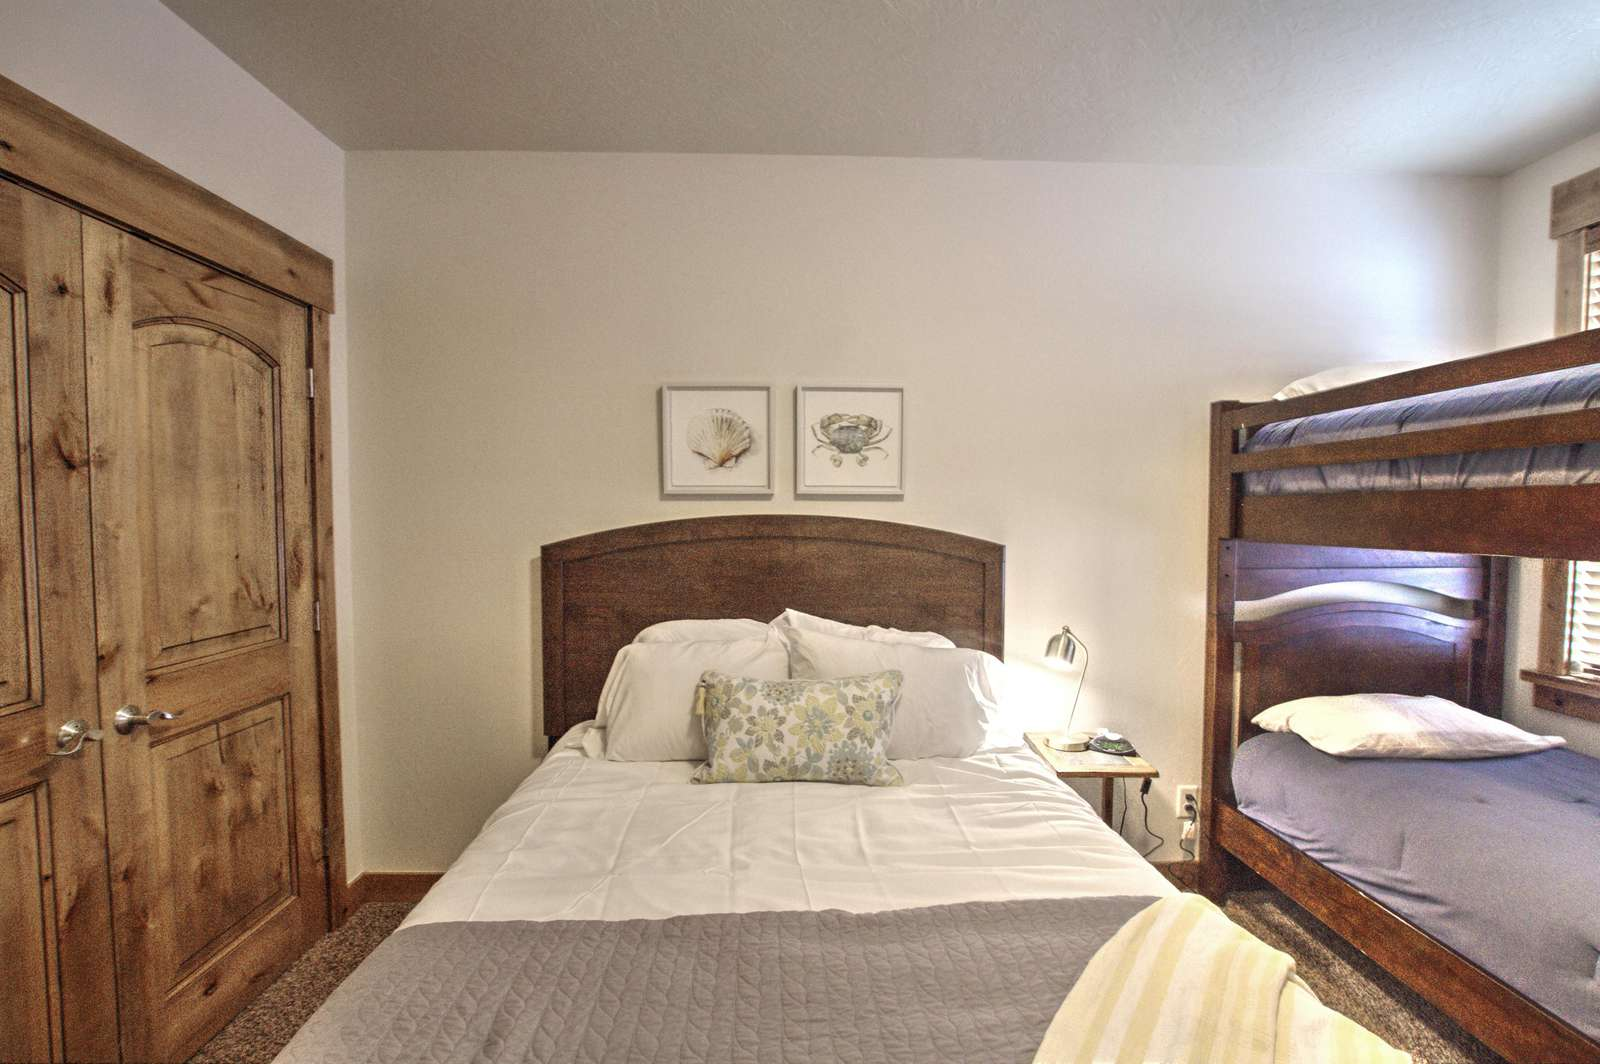 1st basement bedroom